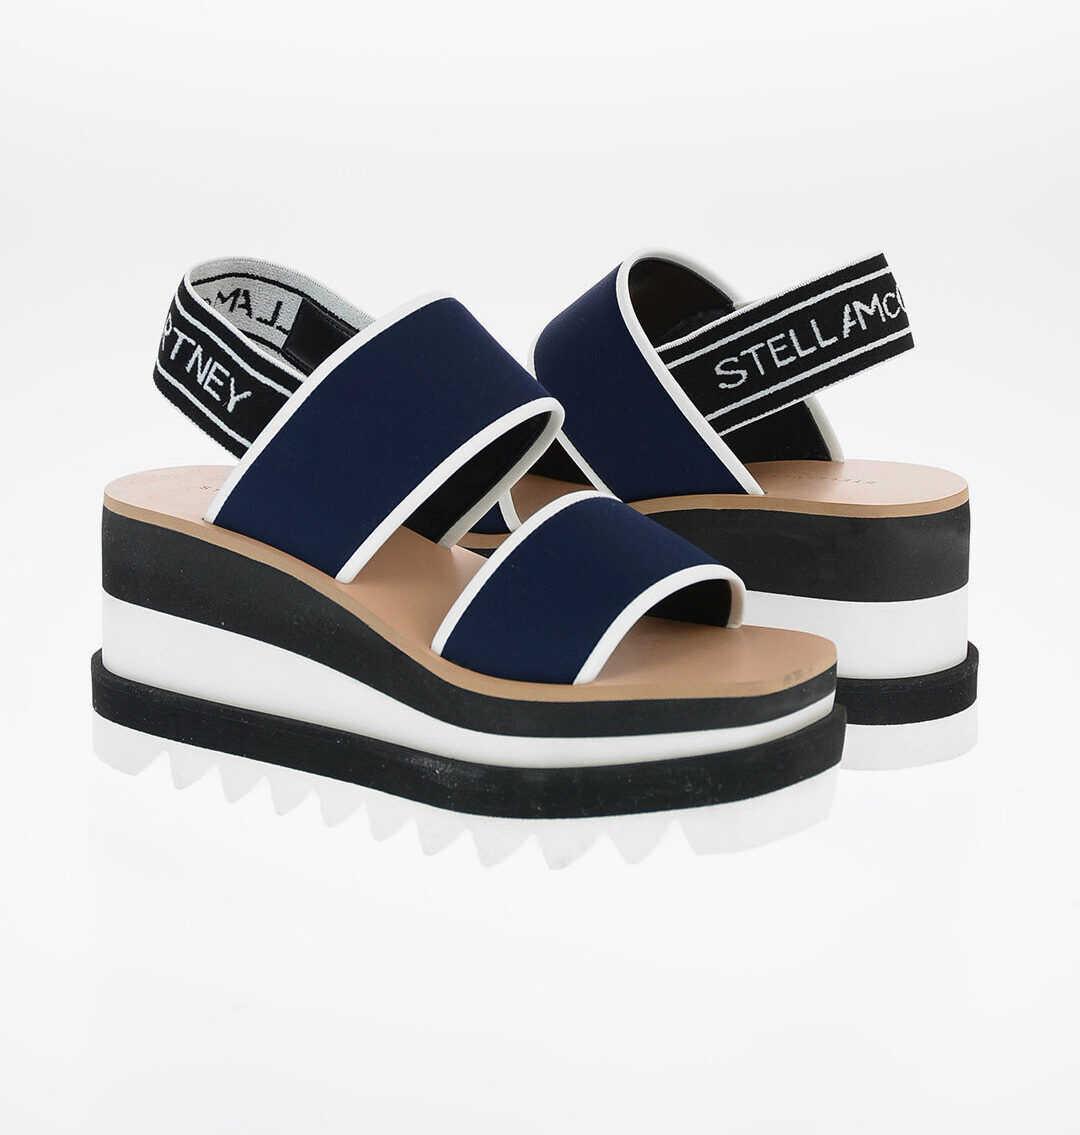 Stella McCartney Stretchy Fabric Platform Sandals 8cm BLUE imagine b-mall.ro